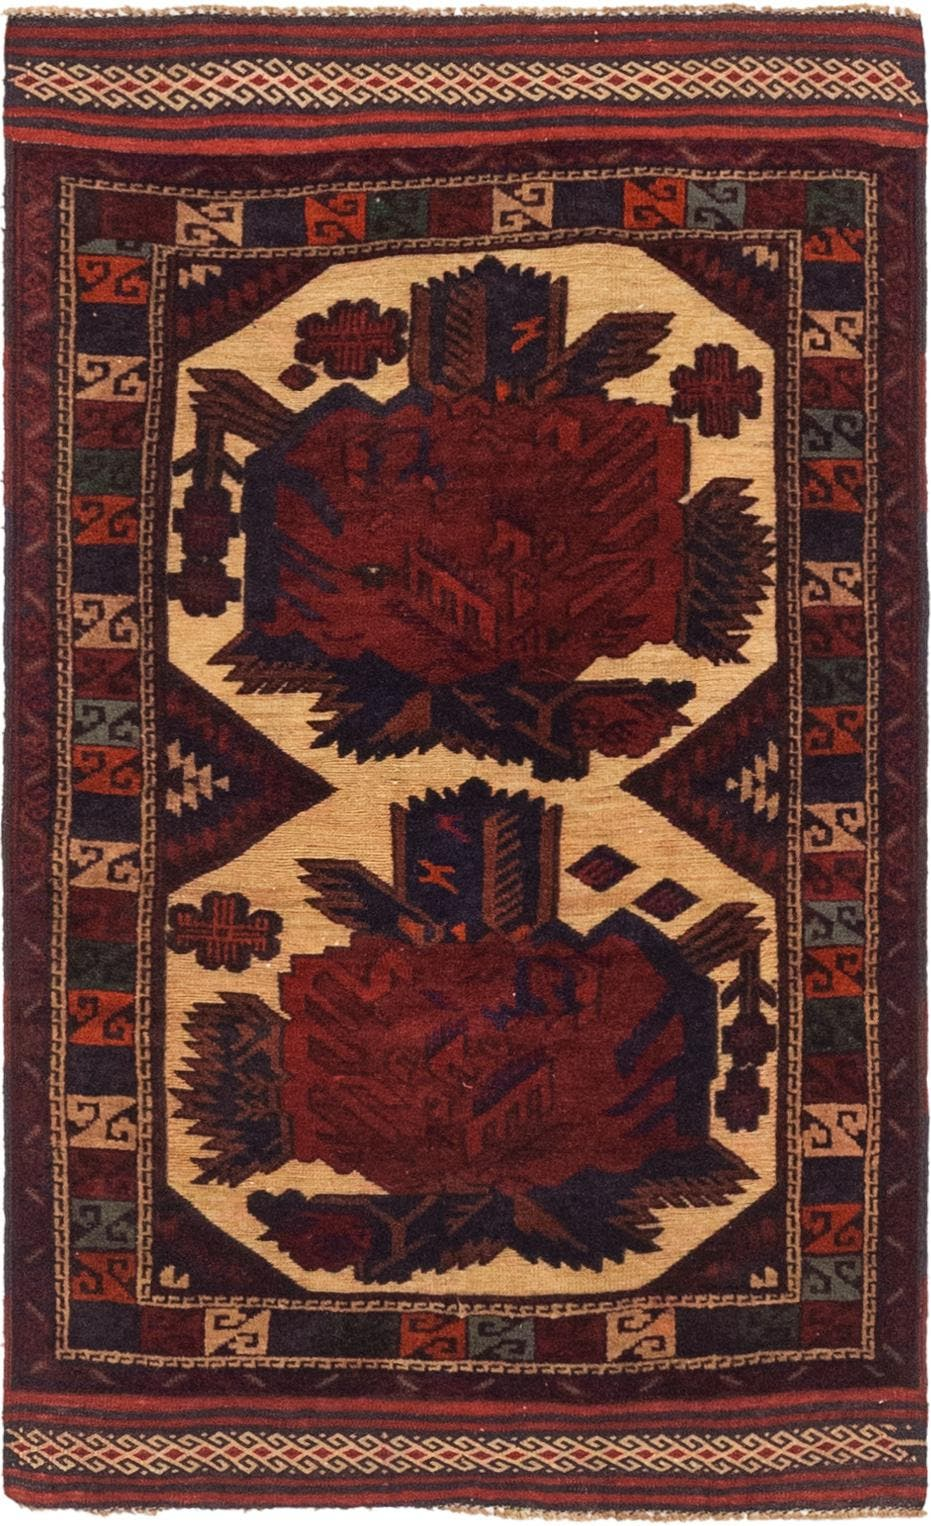 2' 8 x 4' 5 Sumak Rug main image